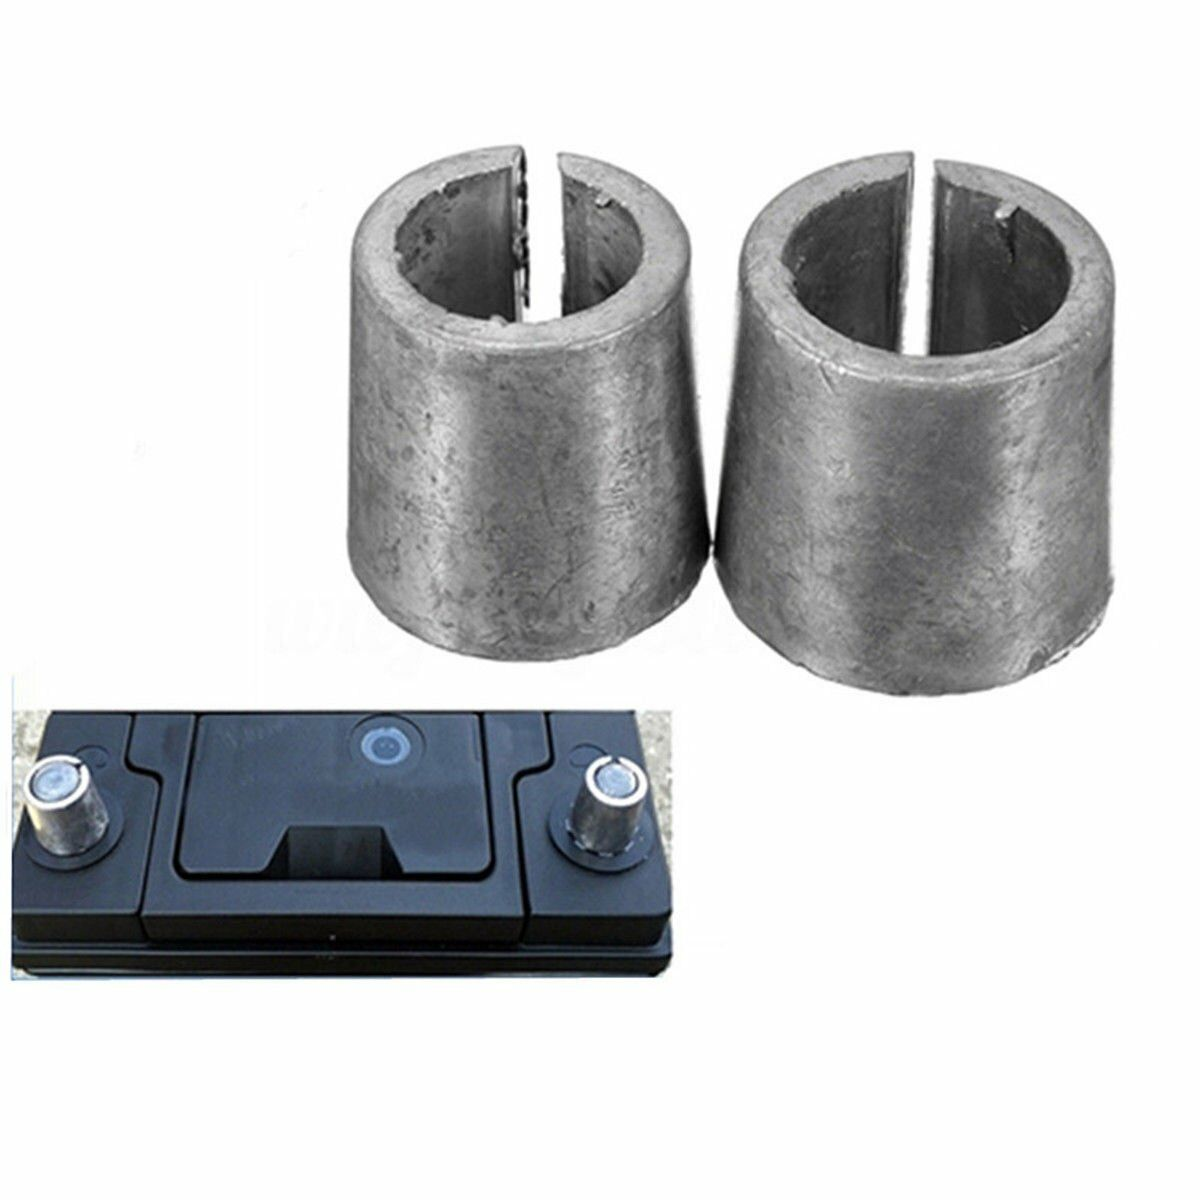 2 x Car Battery Terminal Post Converters Adaptors Sleeves 1xPOS+1x NEG Set uS